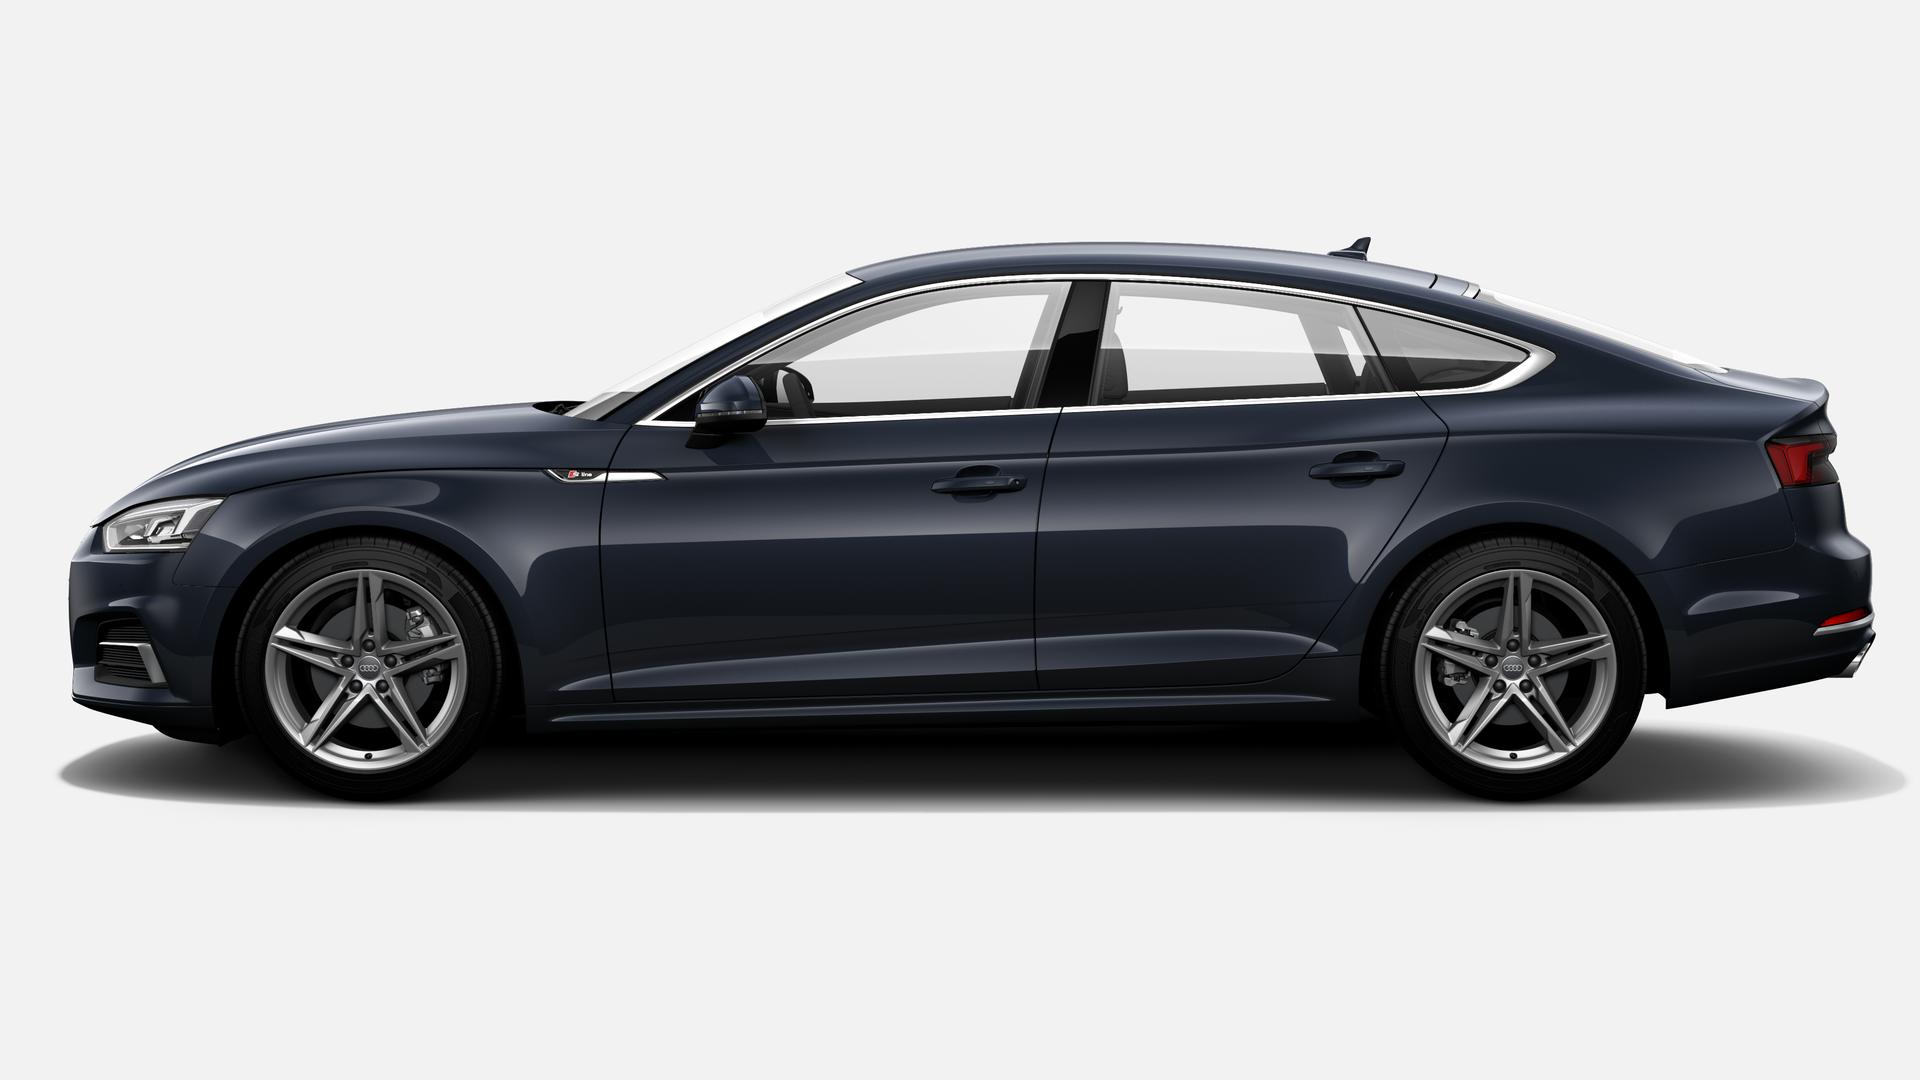 Vista Lateral izquierda de Audi A5 Sportback 2.0 TFSI sport 140 kW (190 CV)